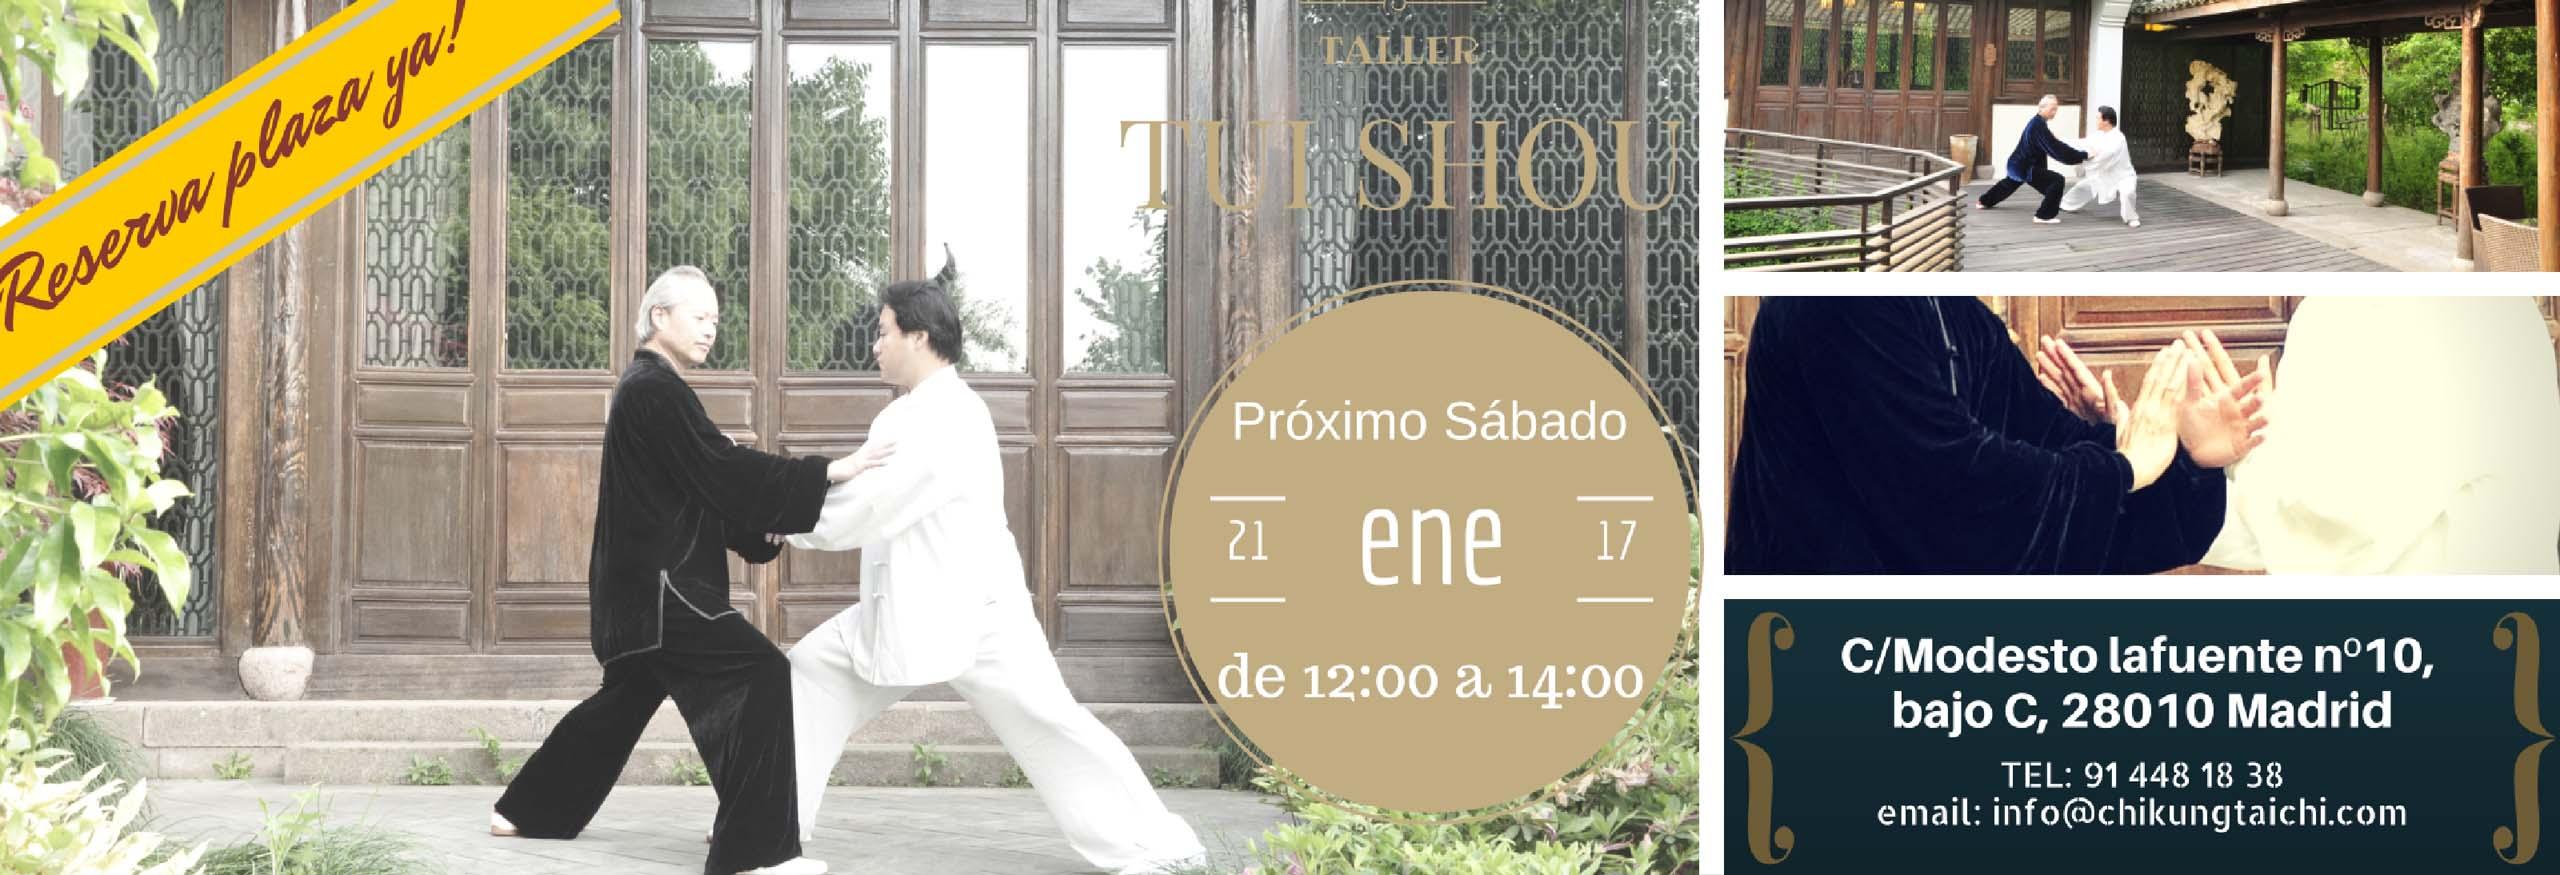 taller-Tui-shou-ene-3